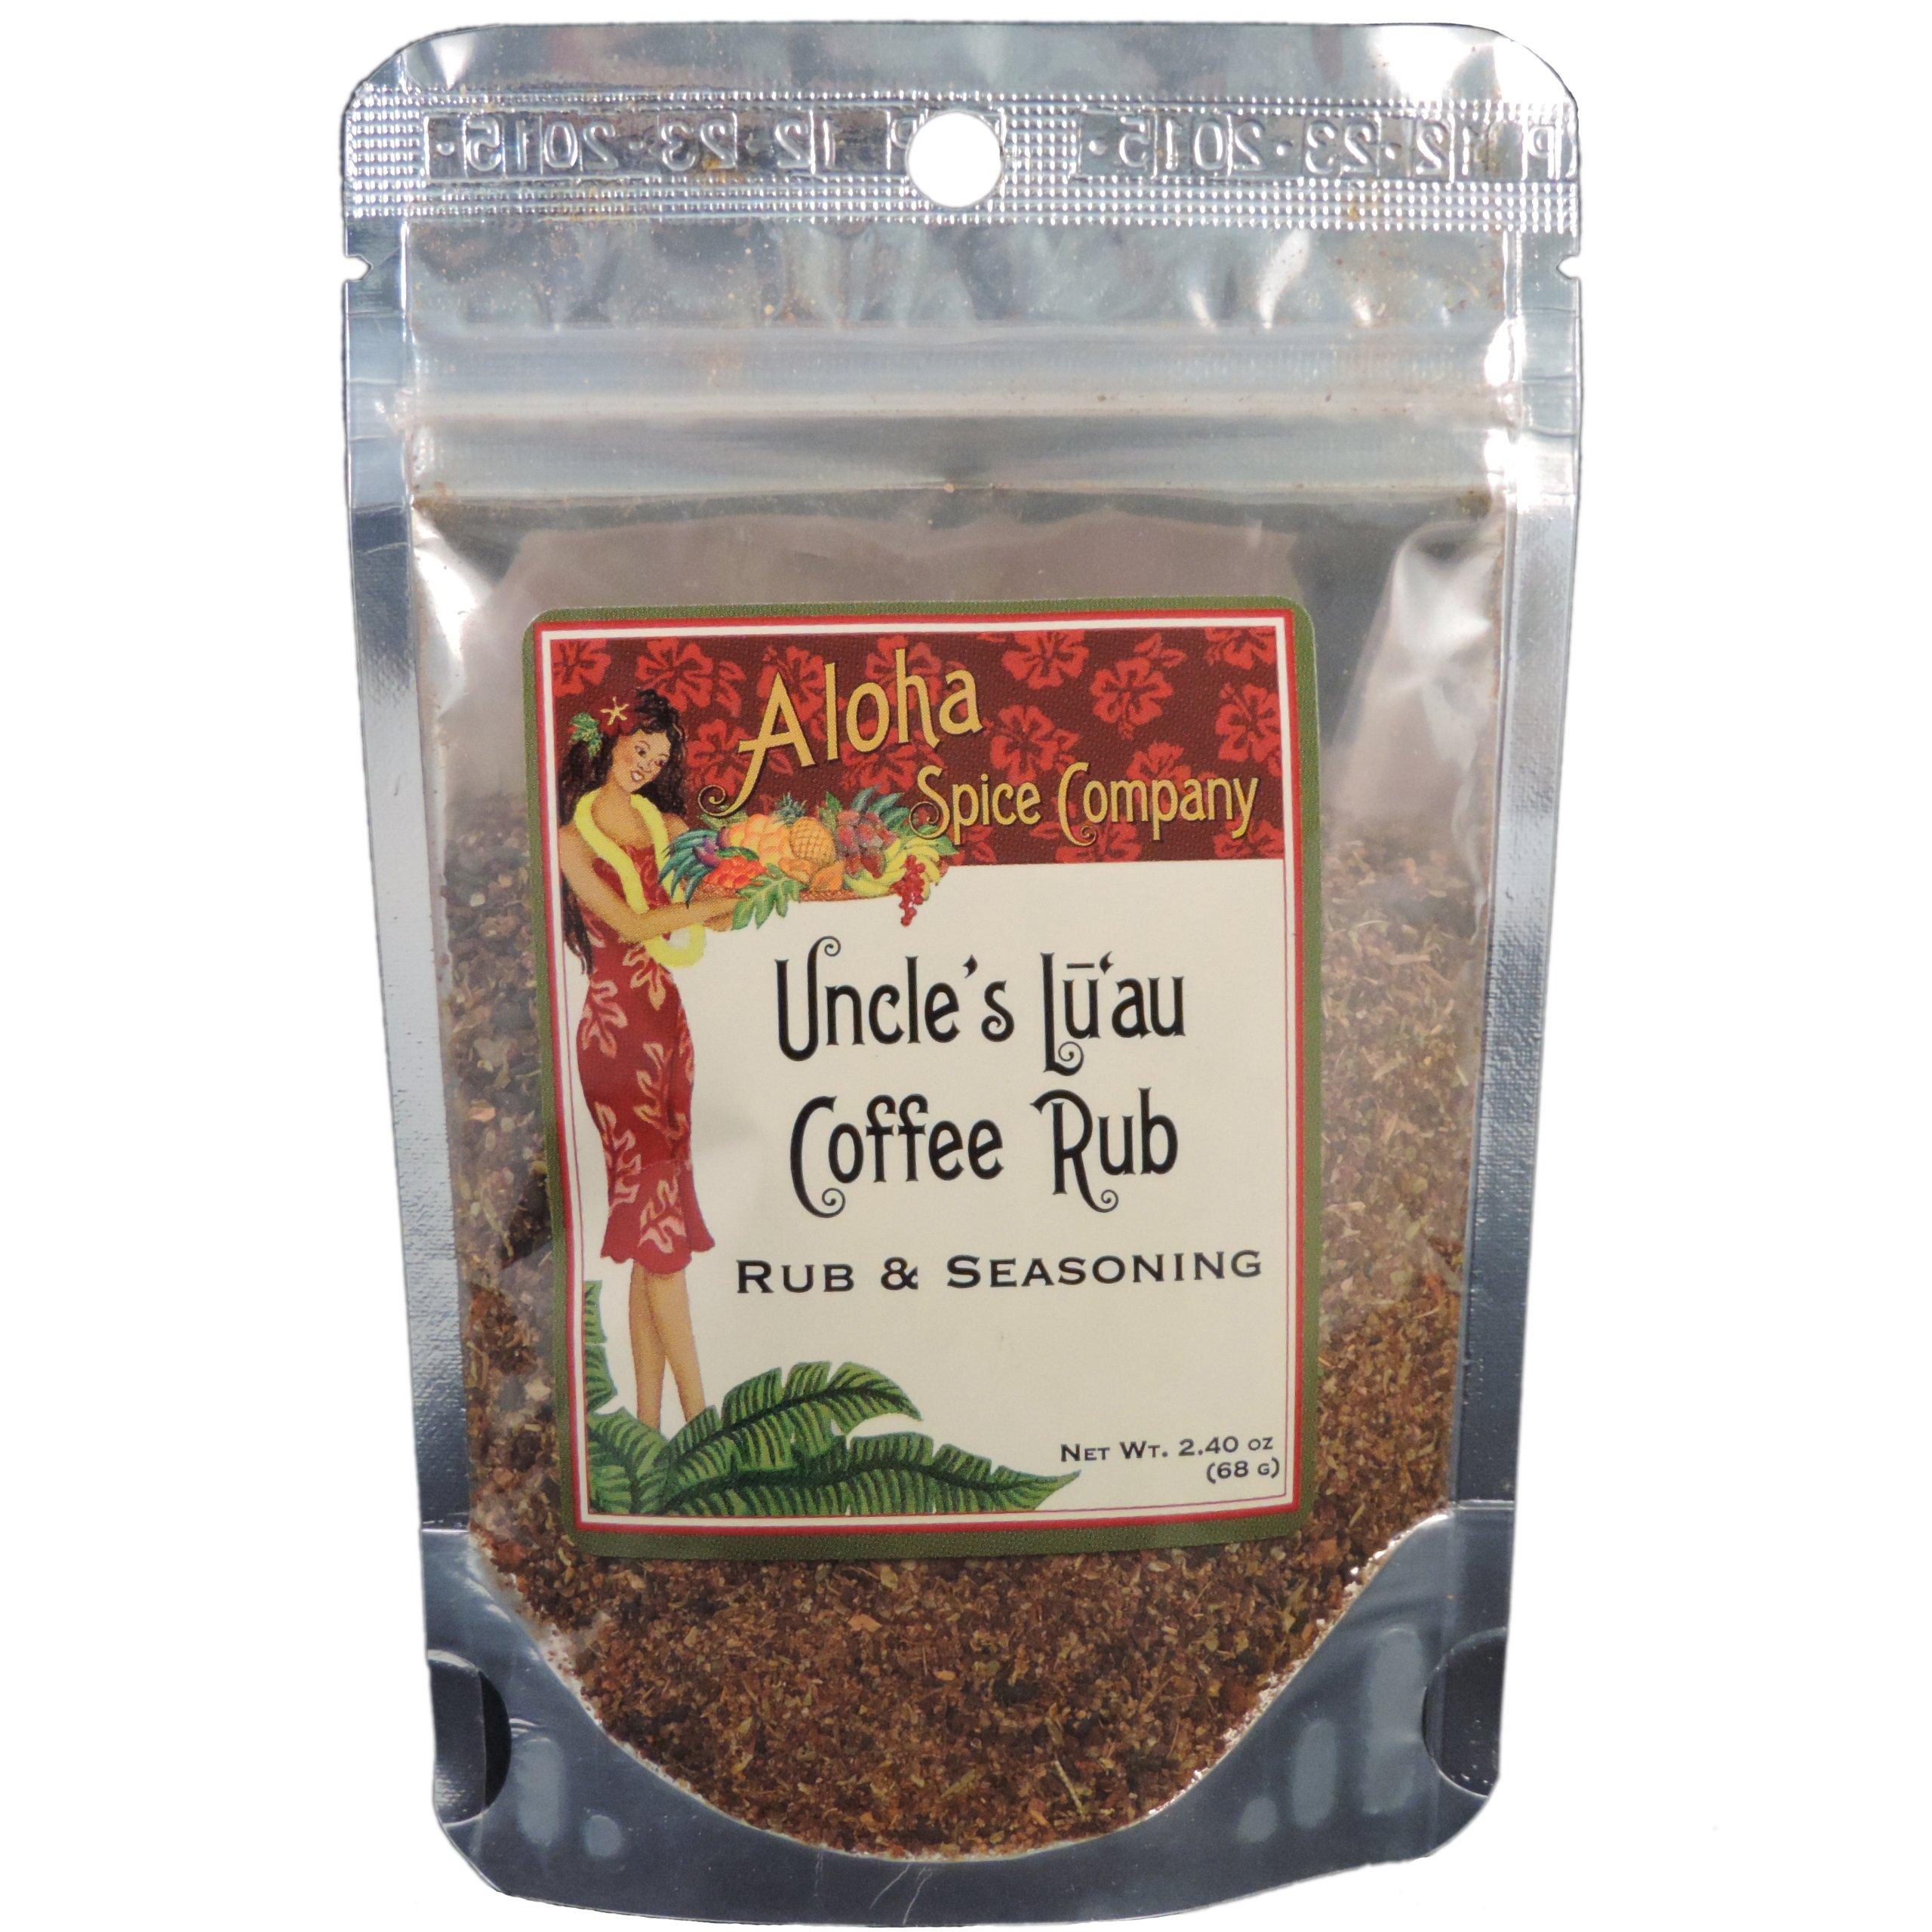 Uncle's Luau Coffee Rub & Seasoning (4 Pack)